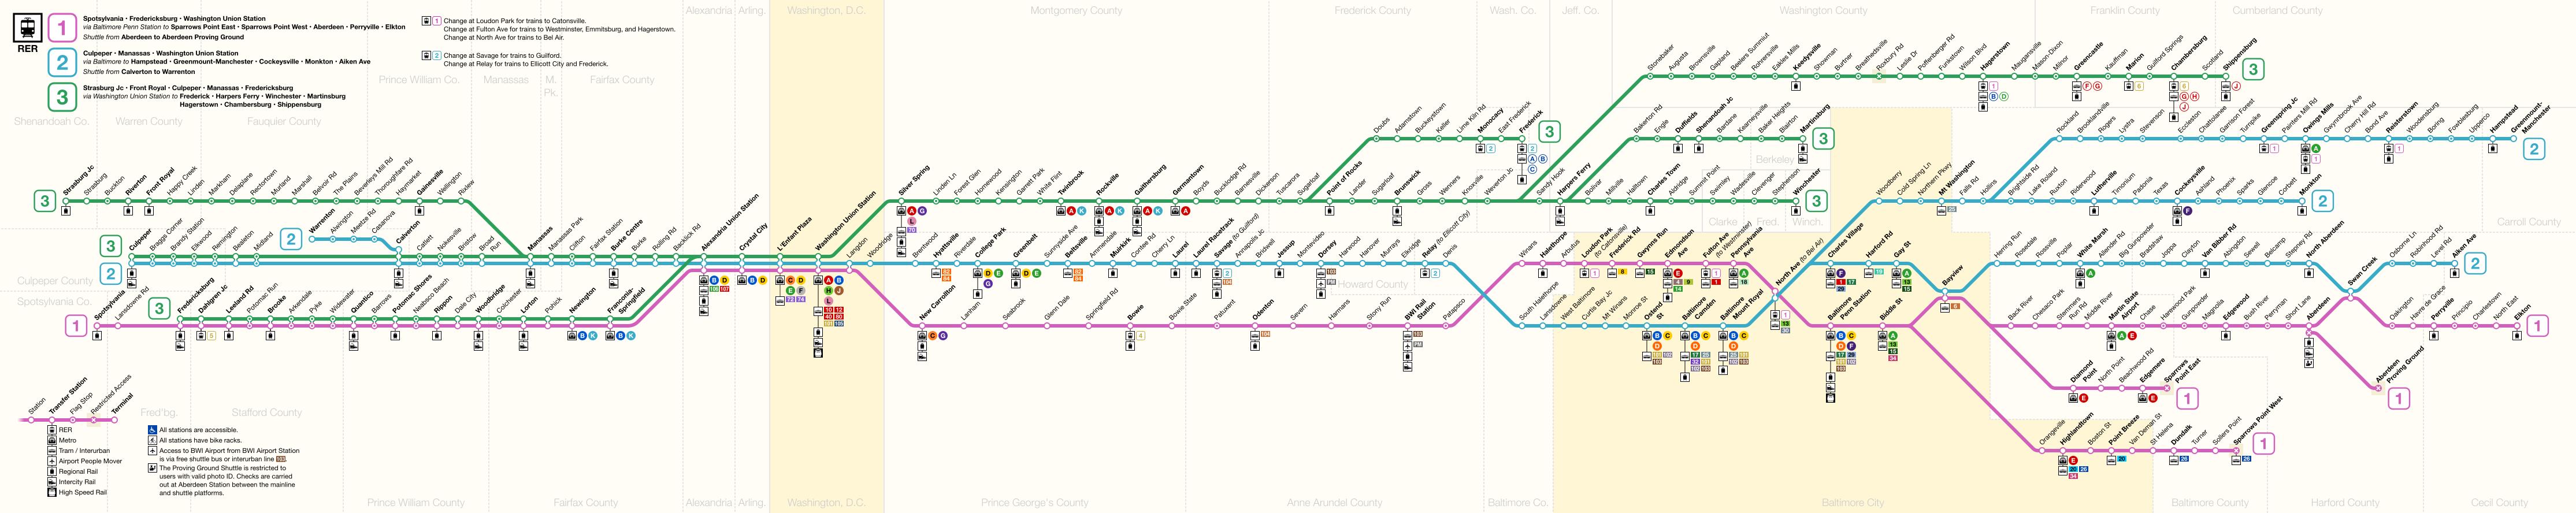 washington union station rer strip map